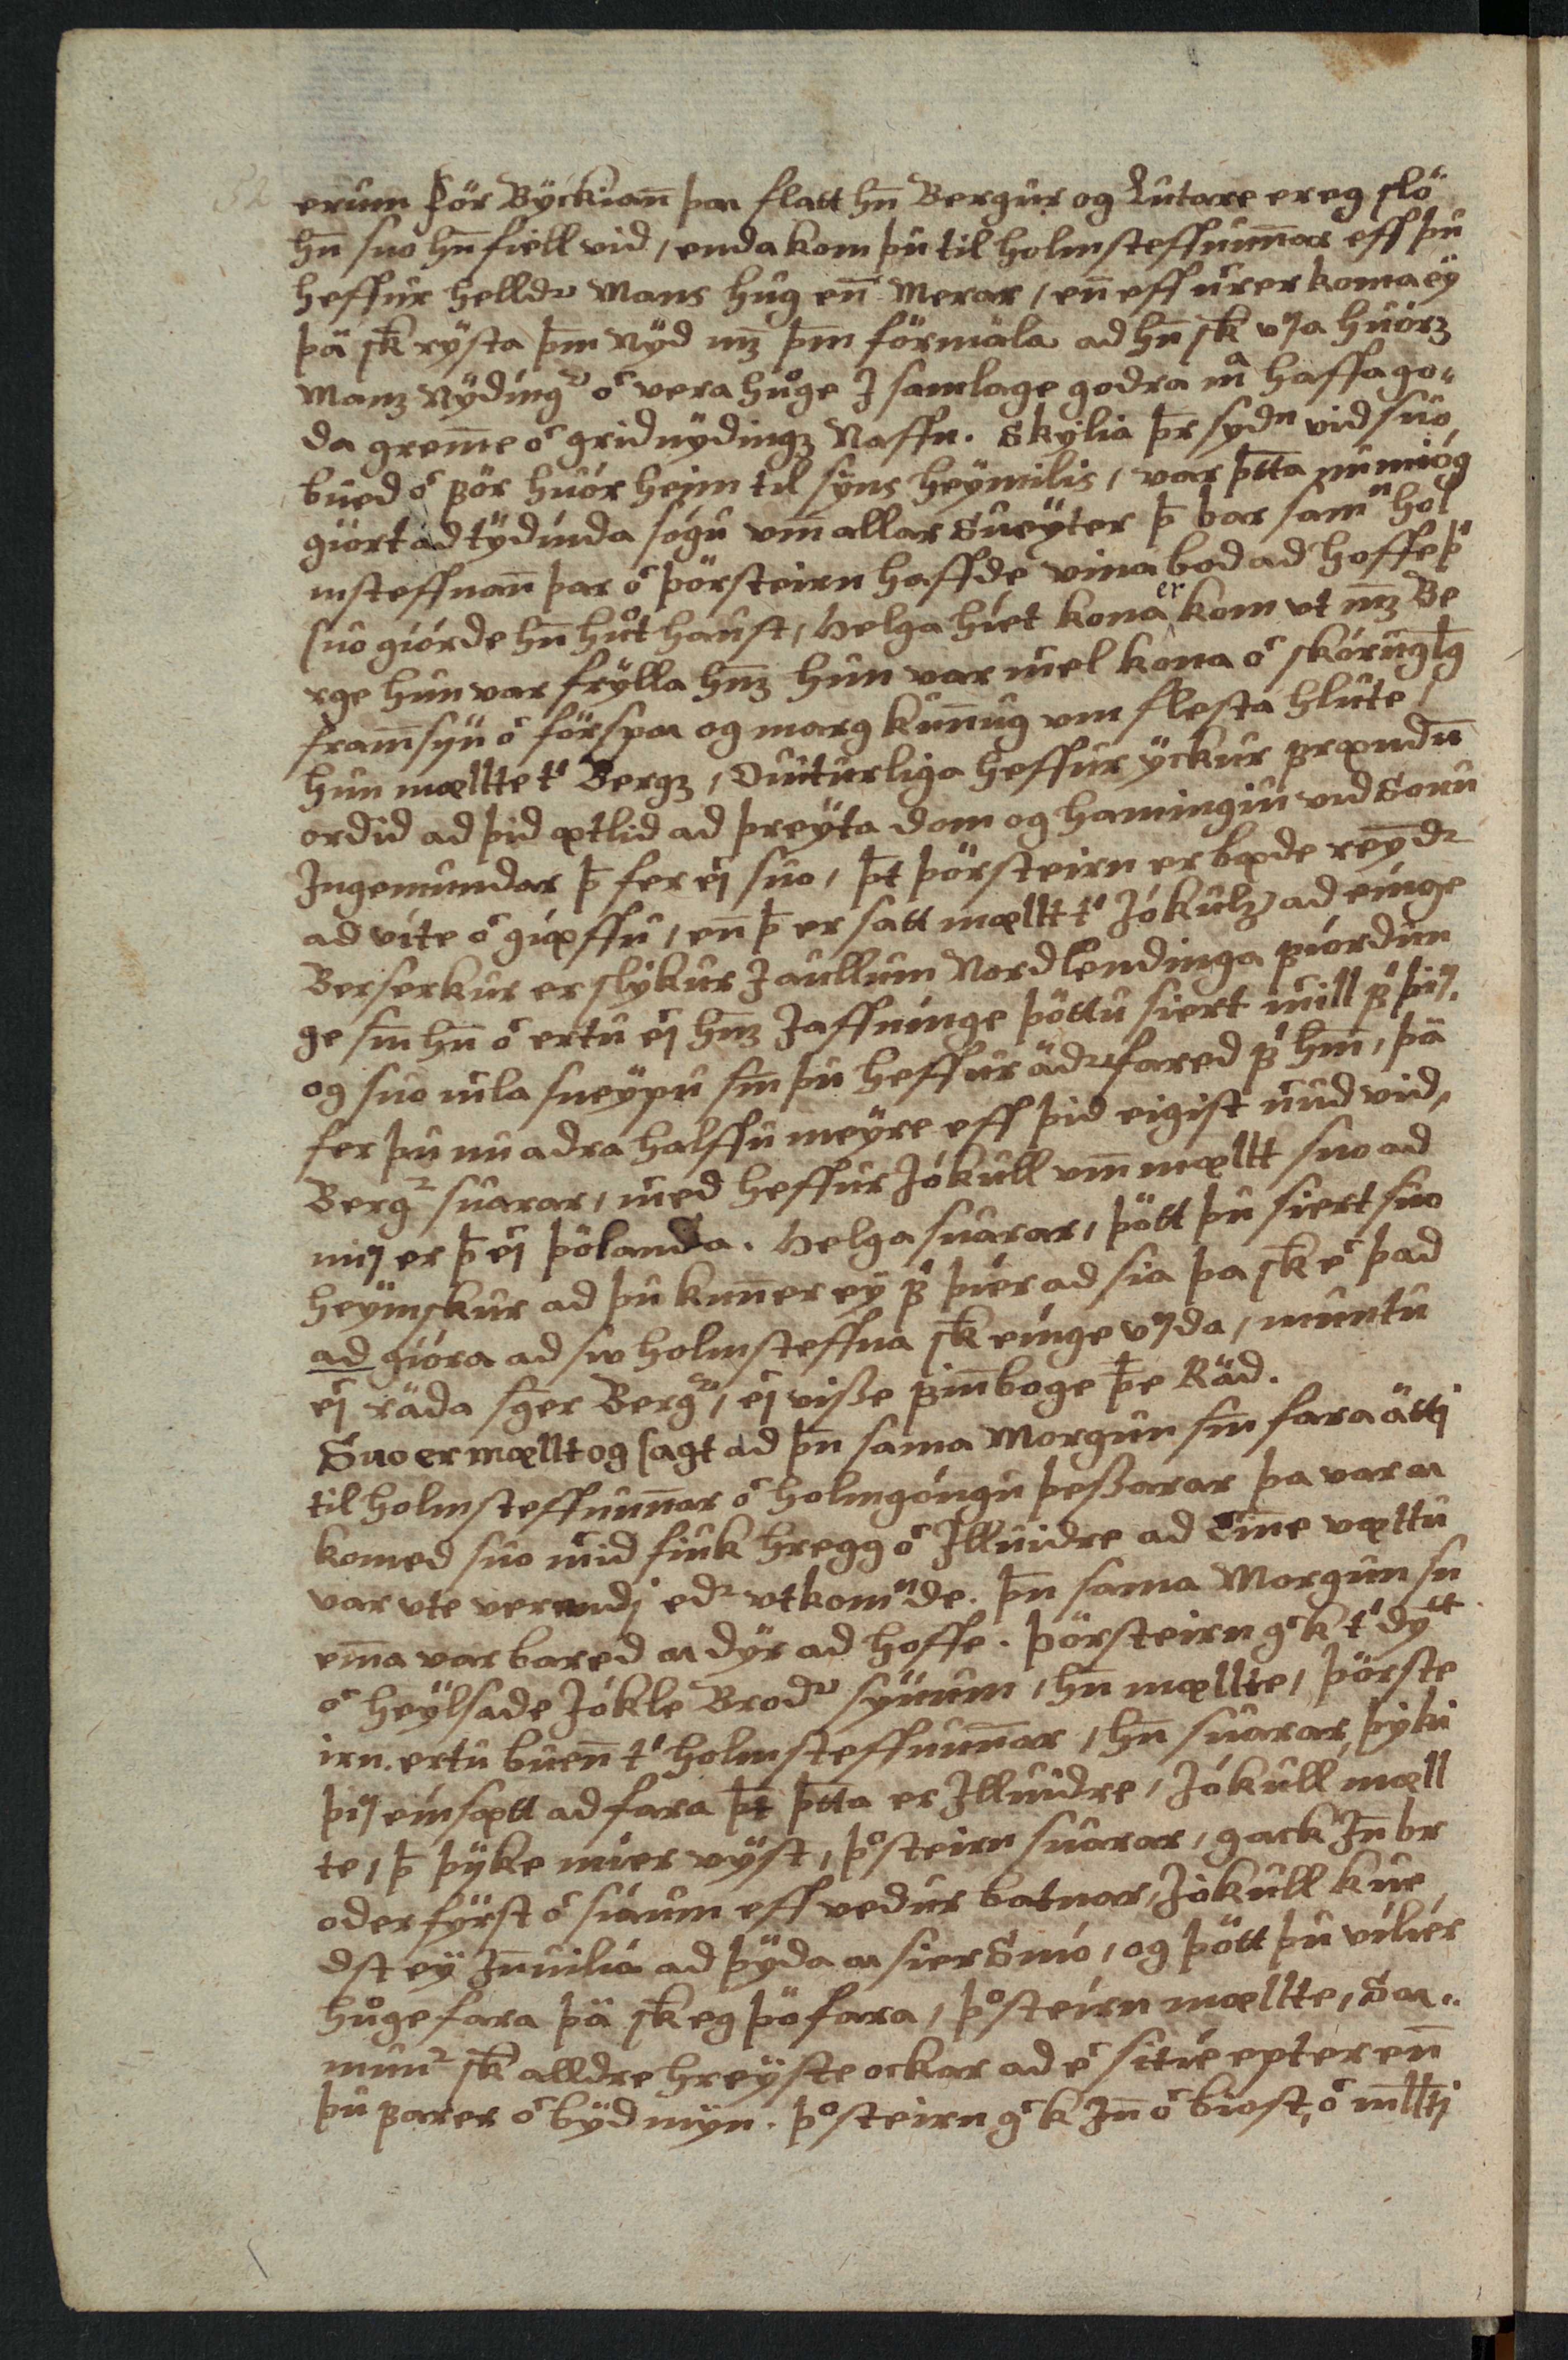 AM 138 fol - 26v